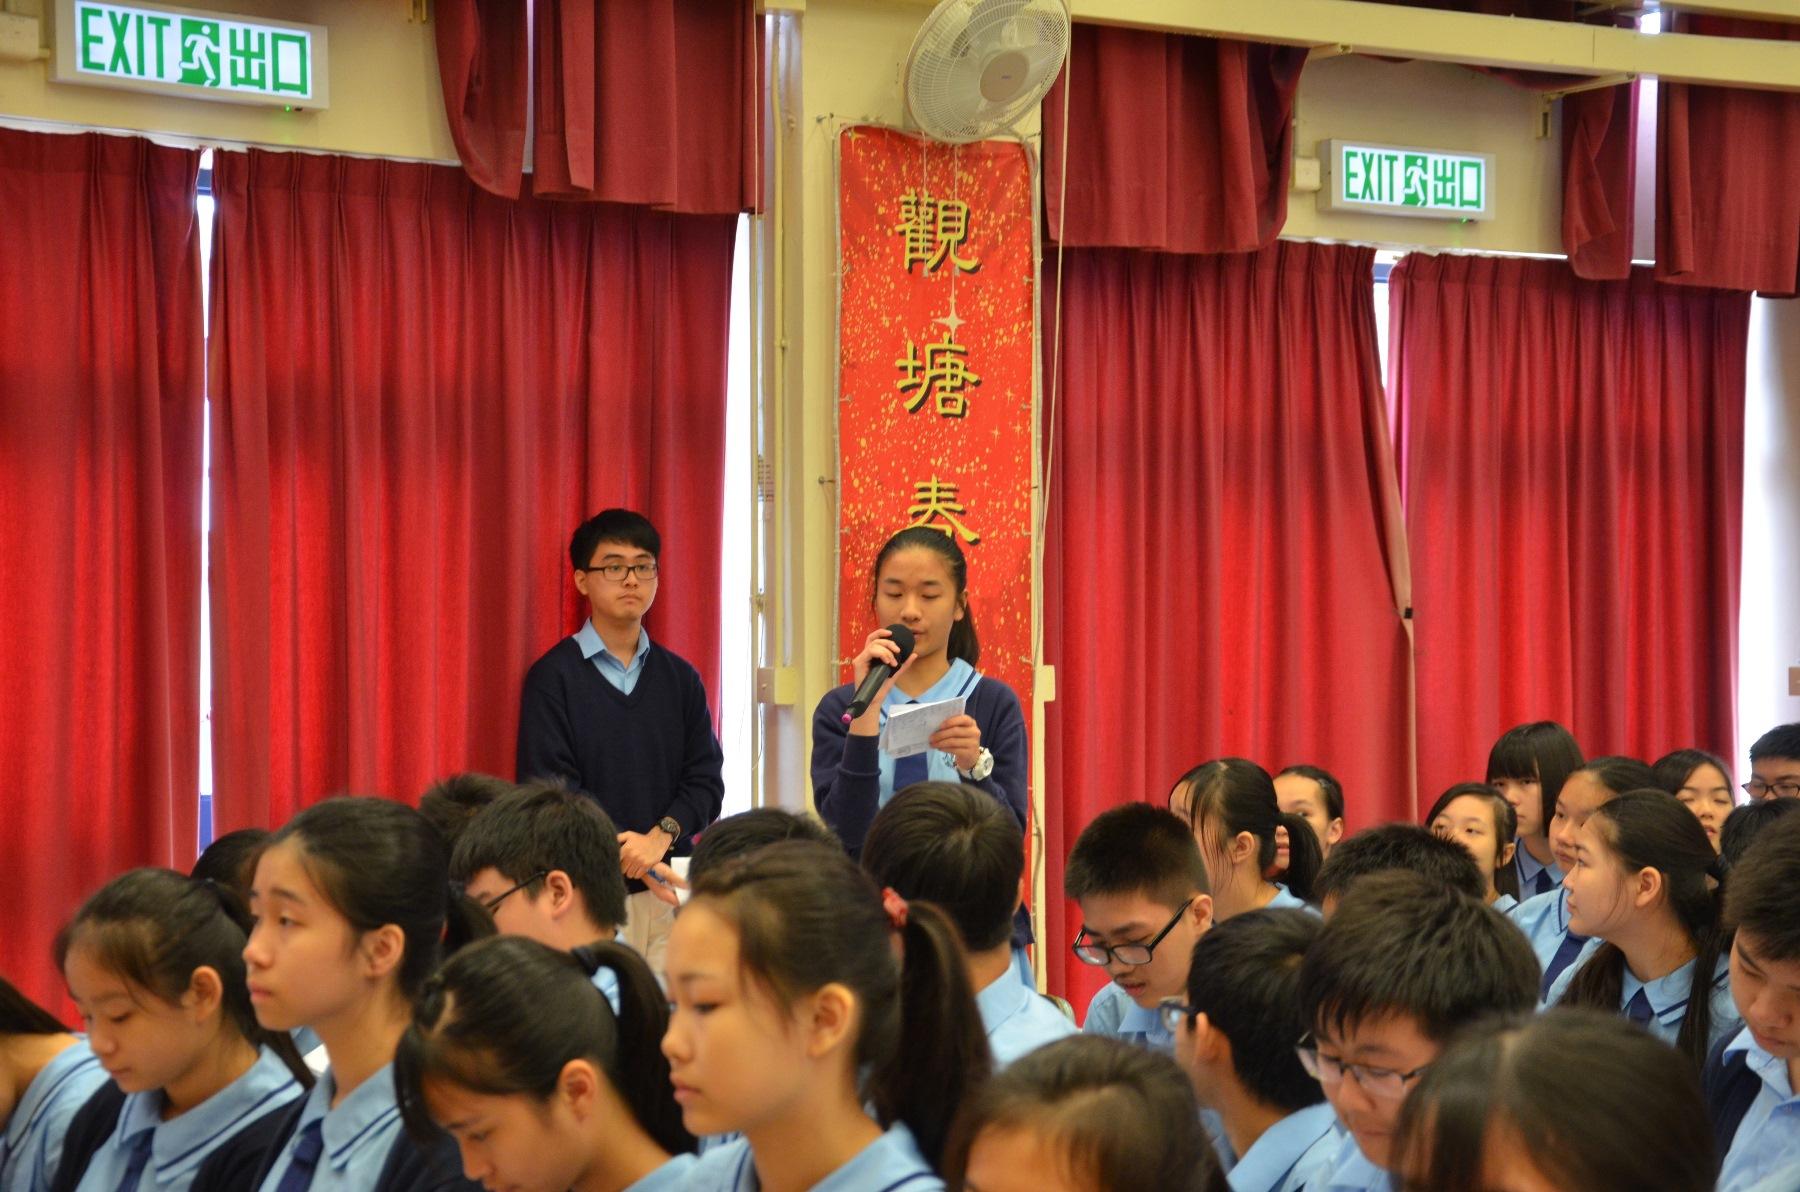 http://www.npc.edu.hk/sites/default/files/dsc_6795.jpg